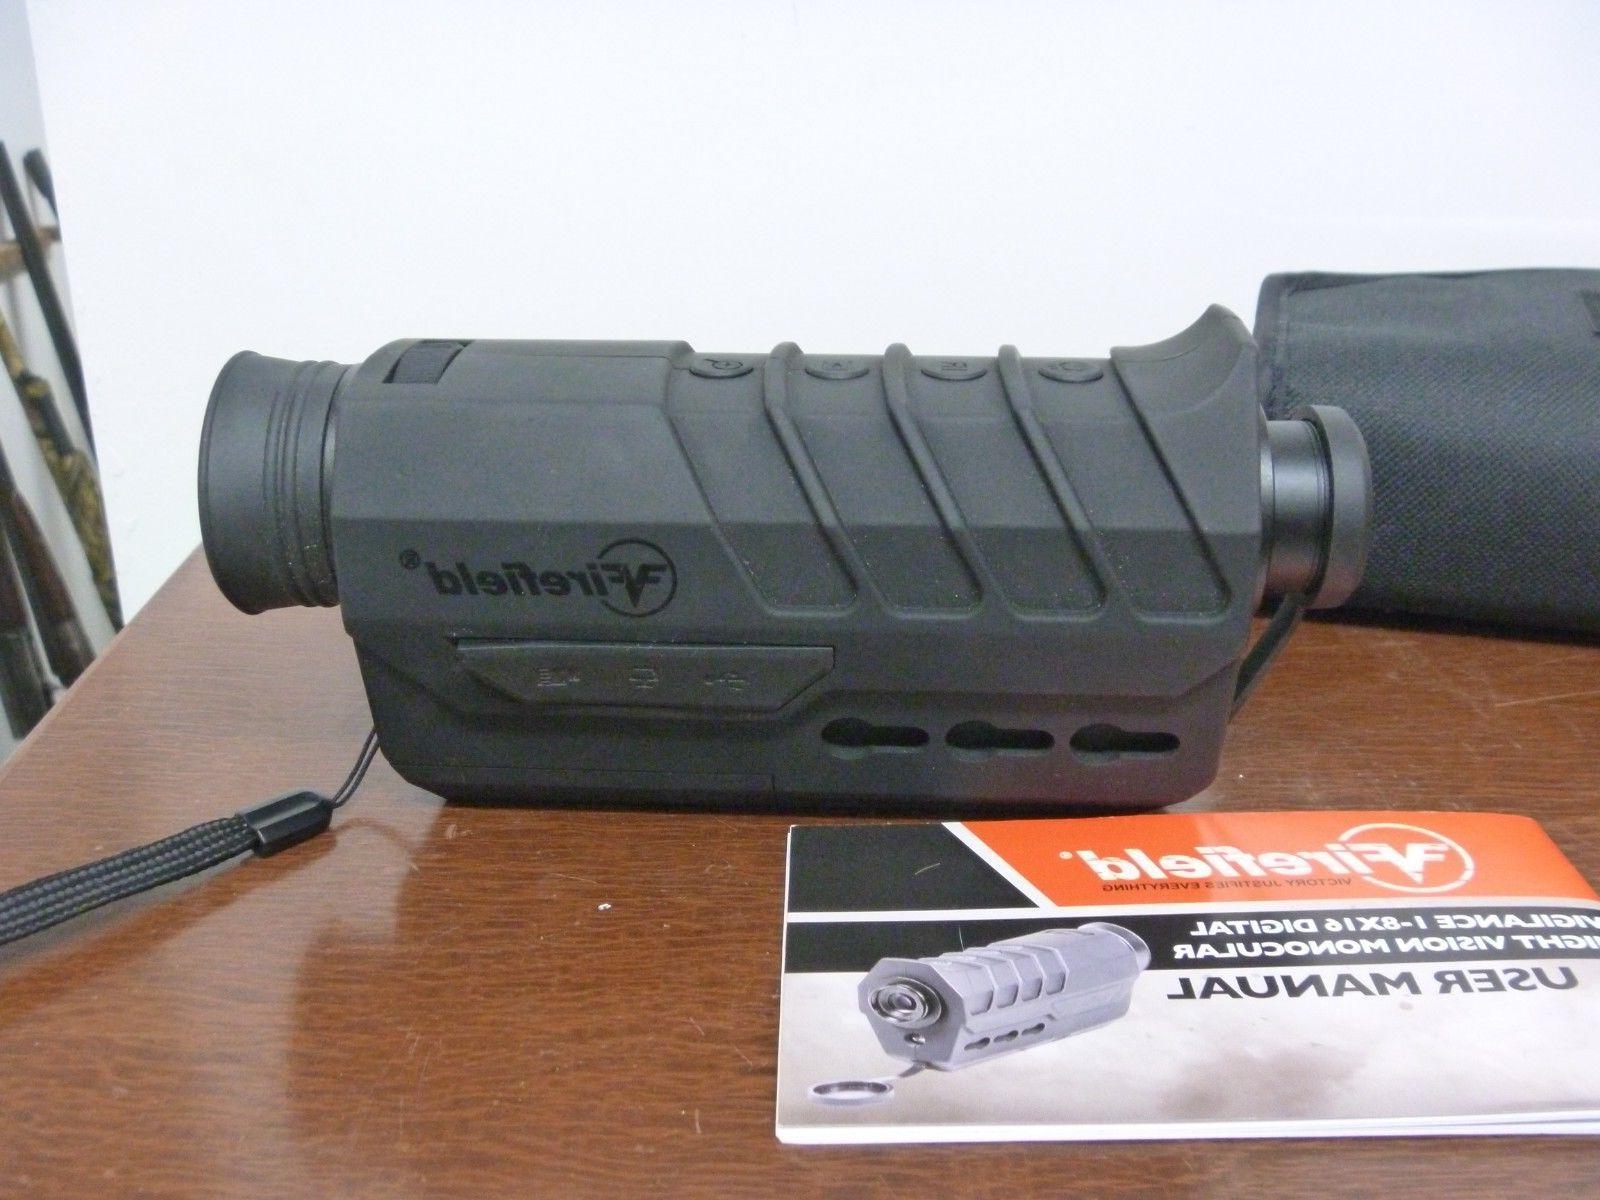 firefild vigilance 1 8x16 digital night vision